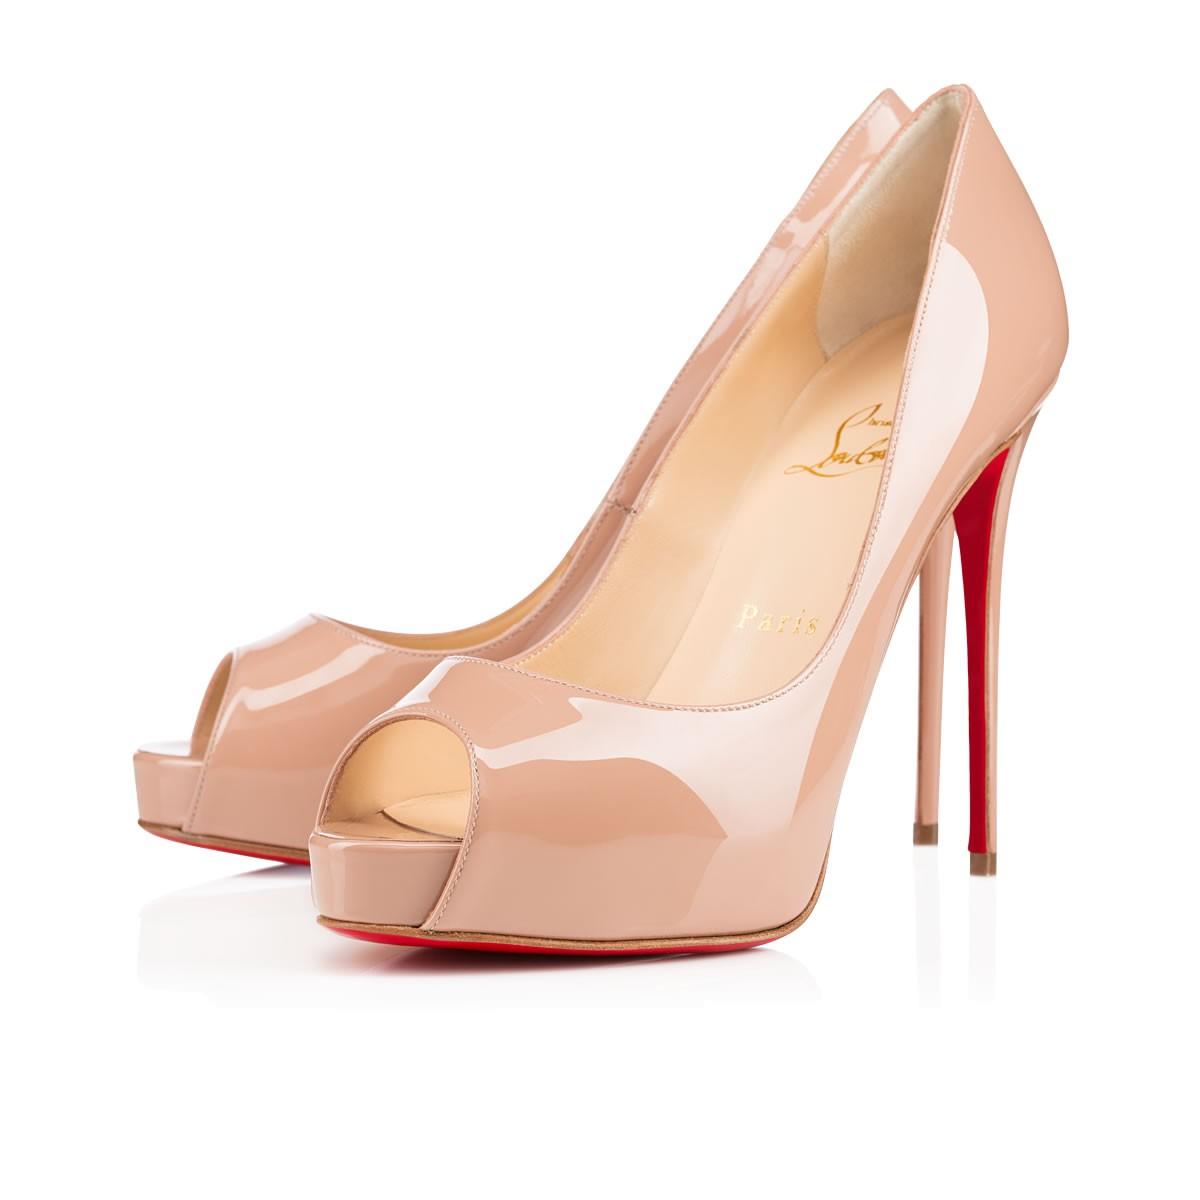 christian louboutin new very prive 120 patent leather peep toe pumps rh modesens com